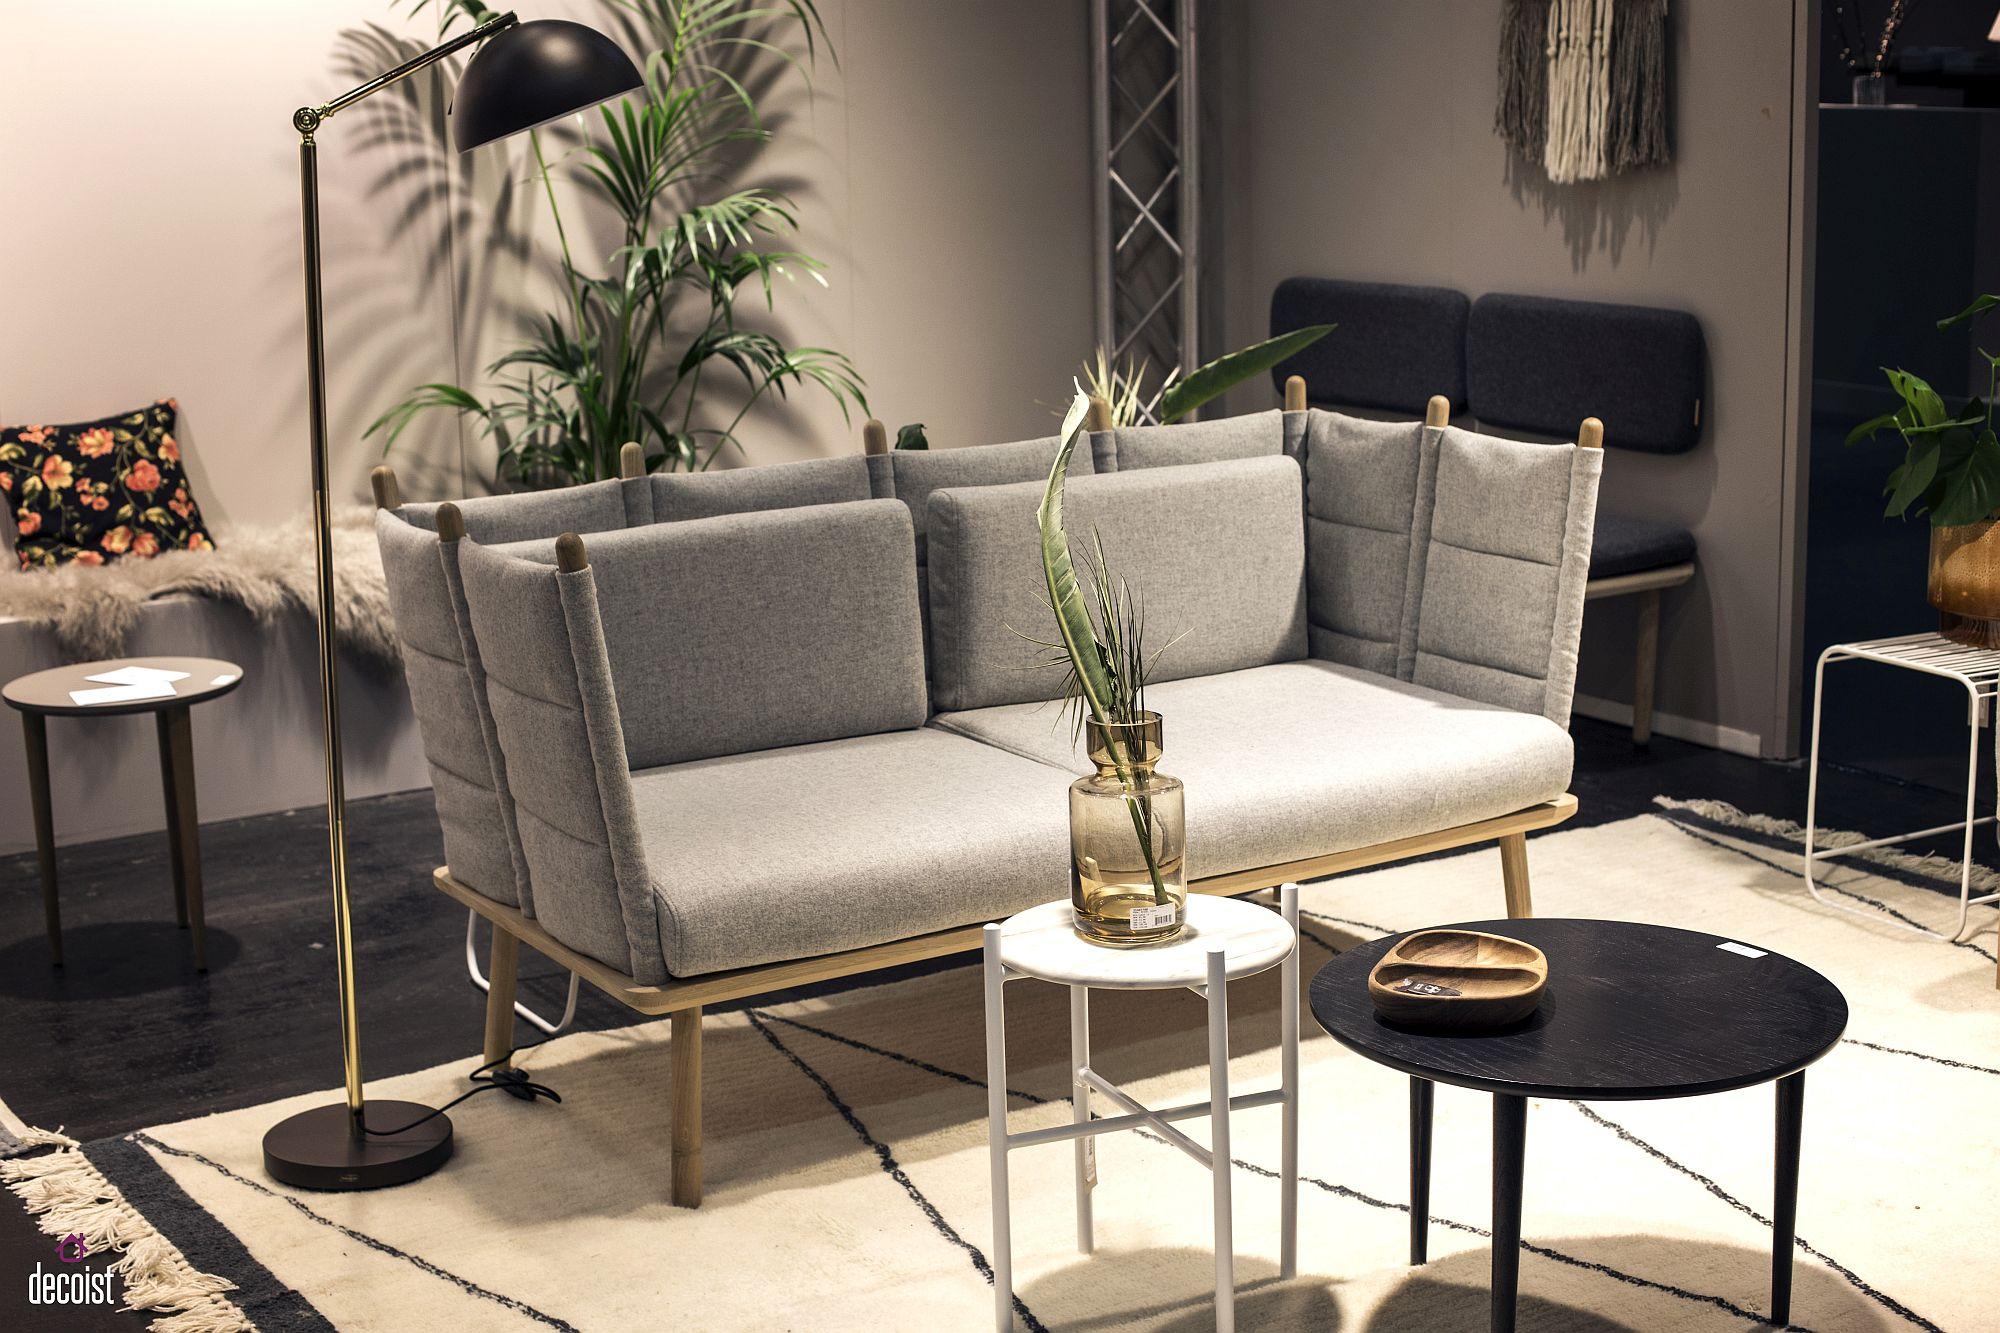 Exquisite-Nordic-decor-from-Bloomingville